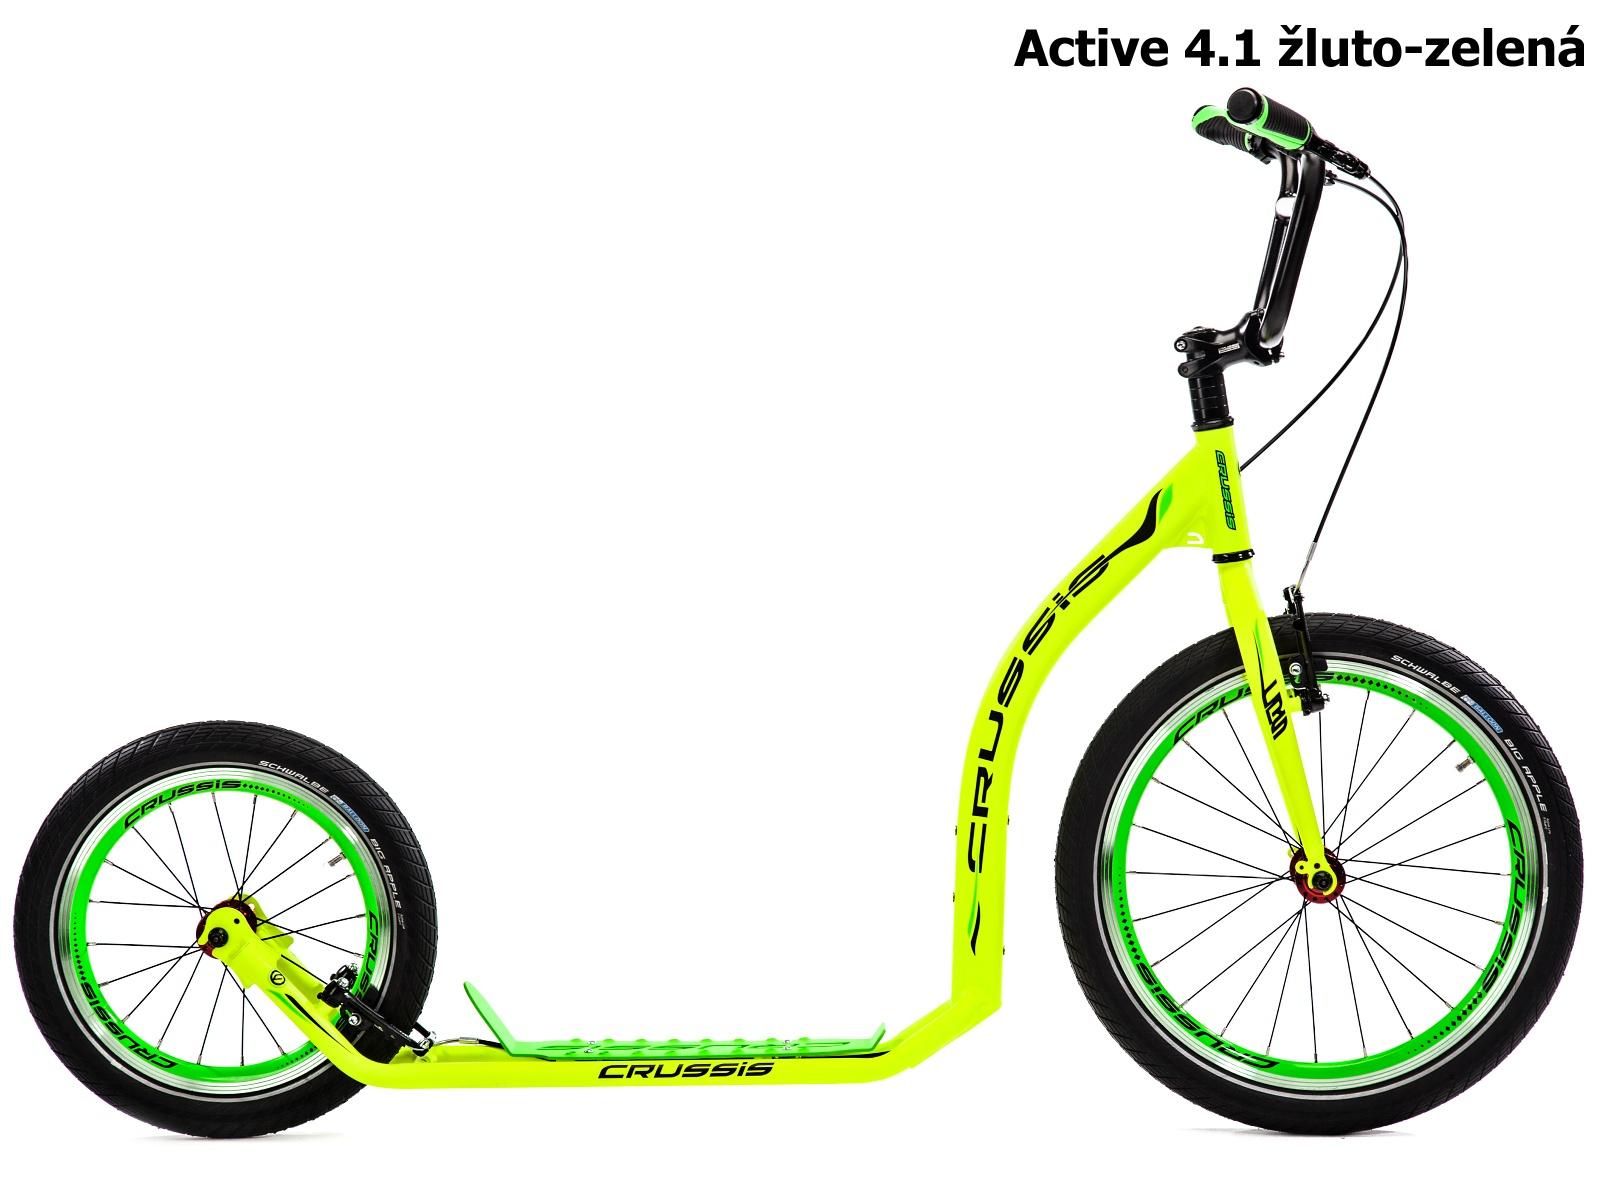 Crussis ACTIVE 4.1 žluto-zelená